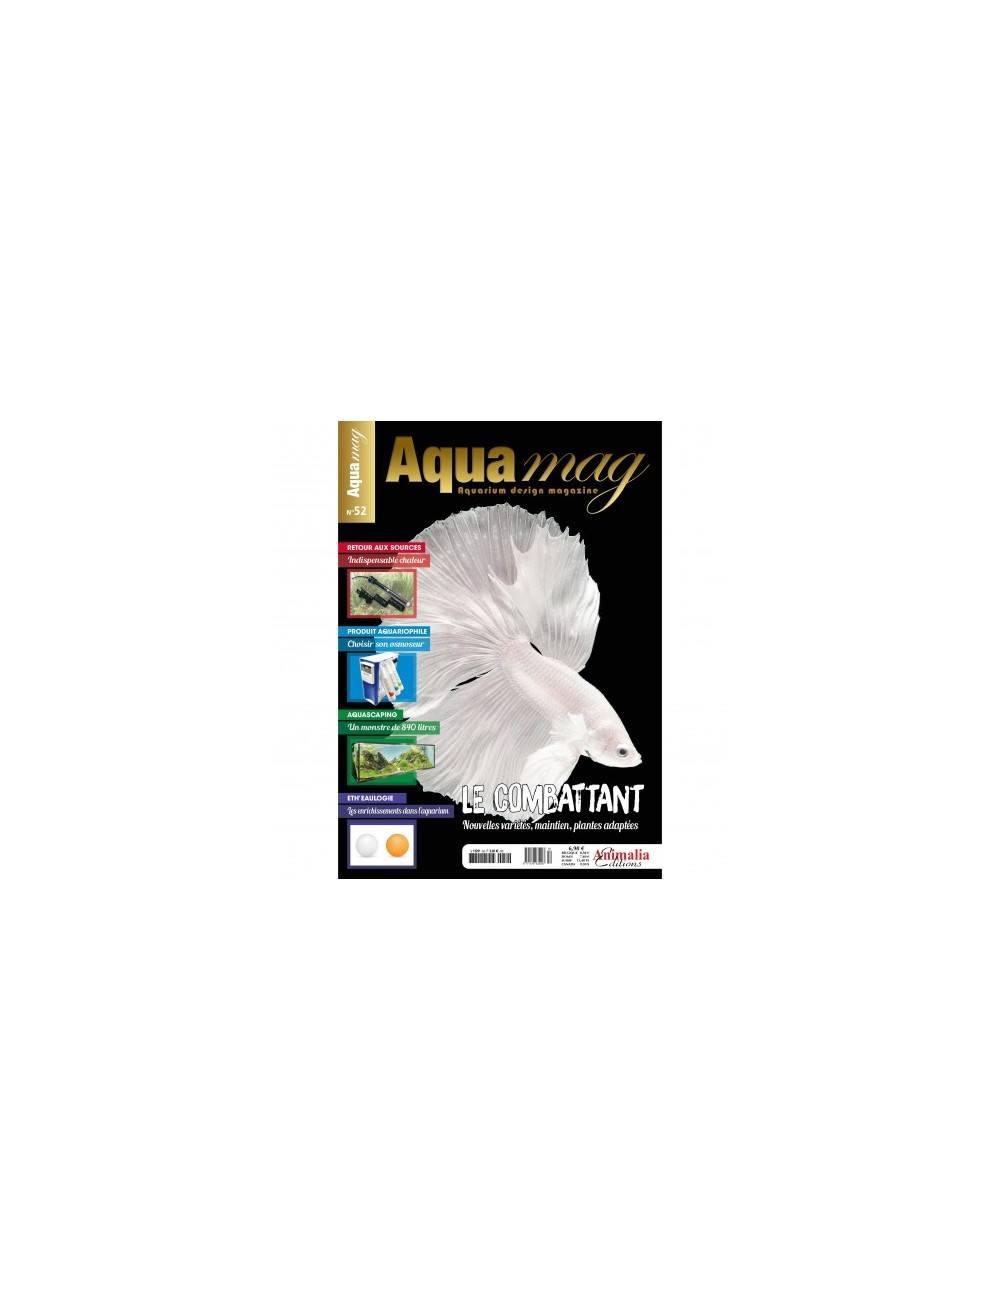 ANIMALIA EDITIONS - AQUAmag N°52